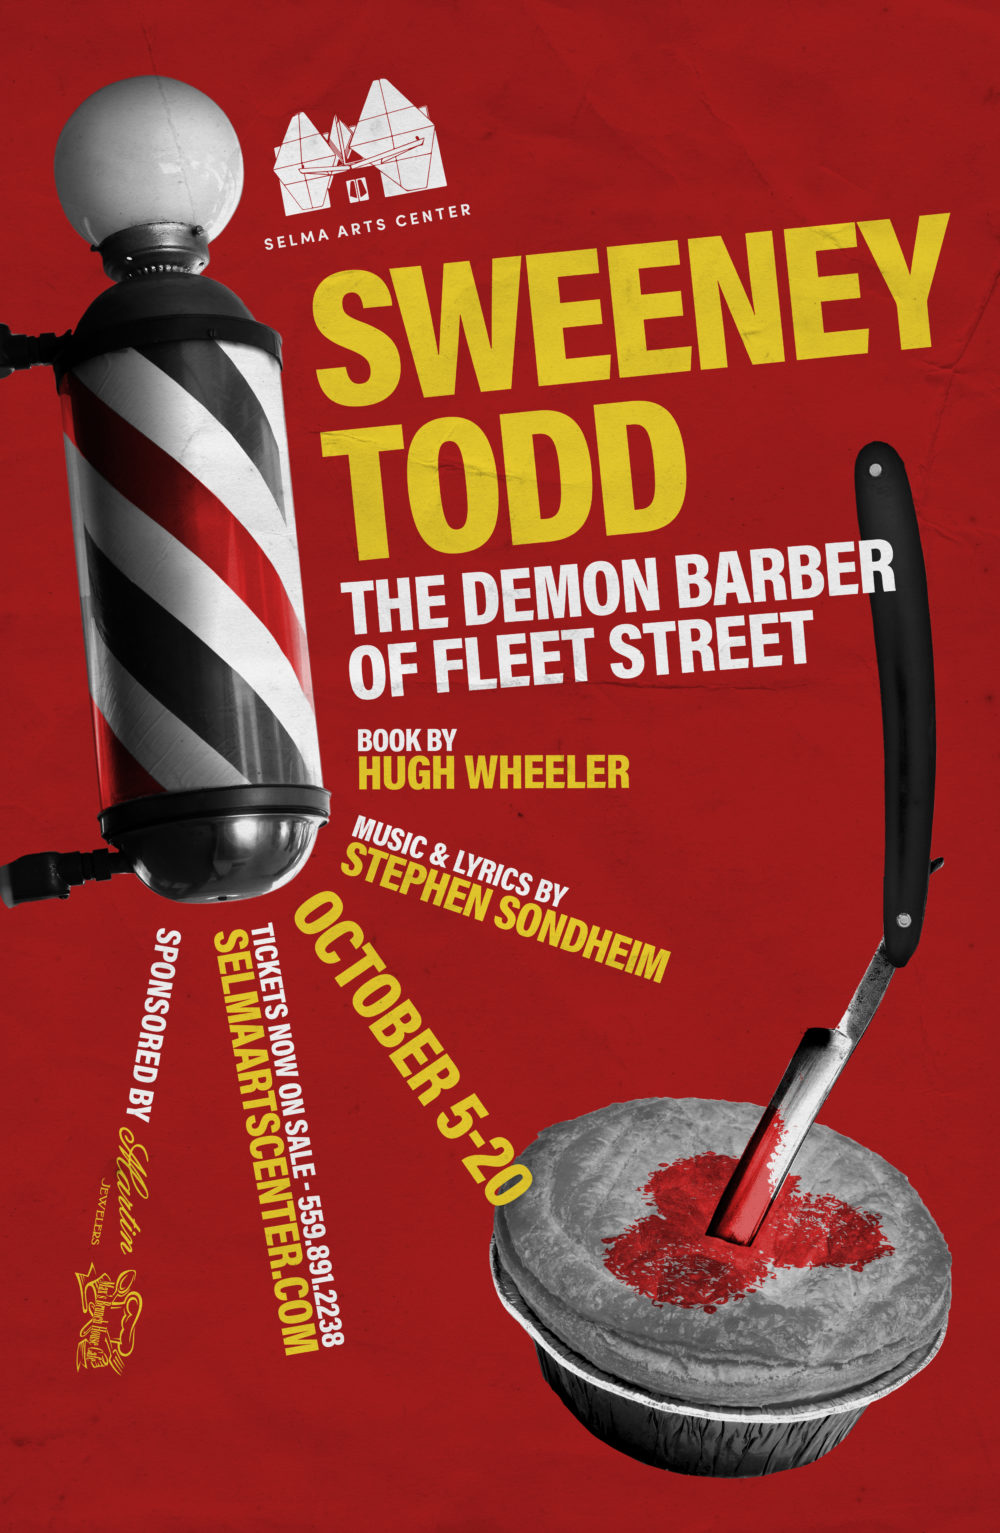 Sweeney todd essay